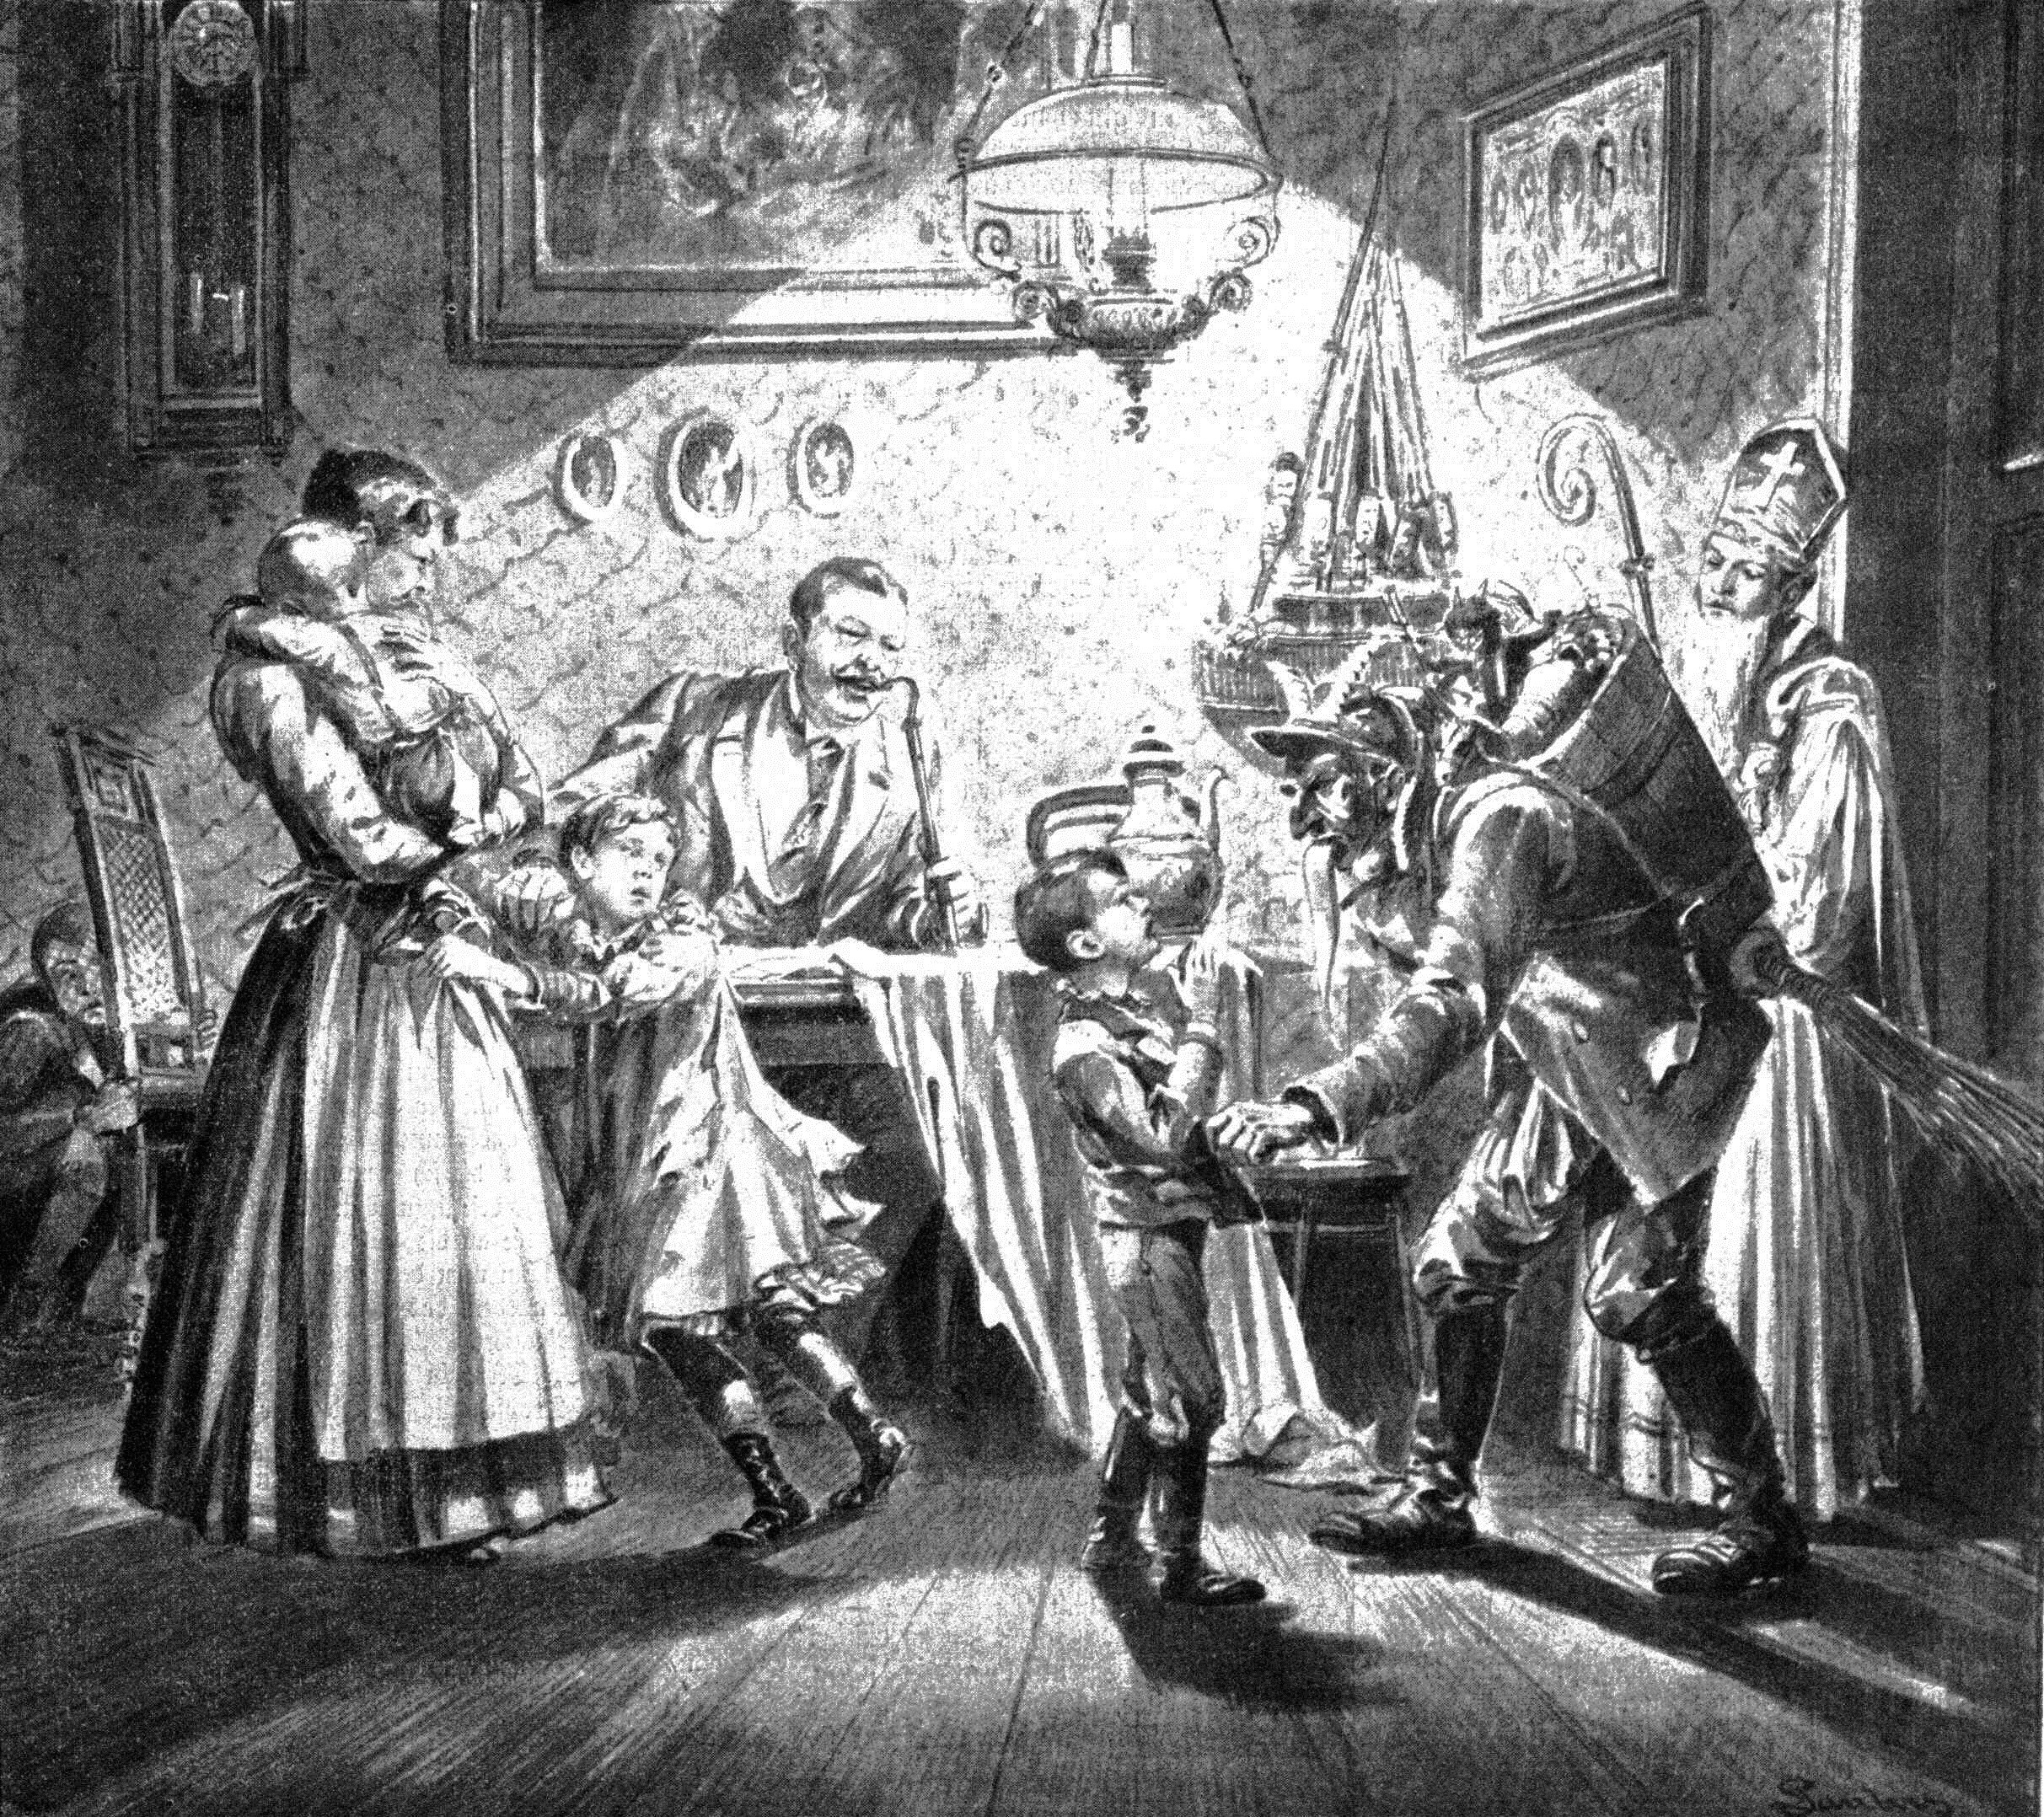 Nikolaus And Krampus In Viennese Home 1896